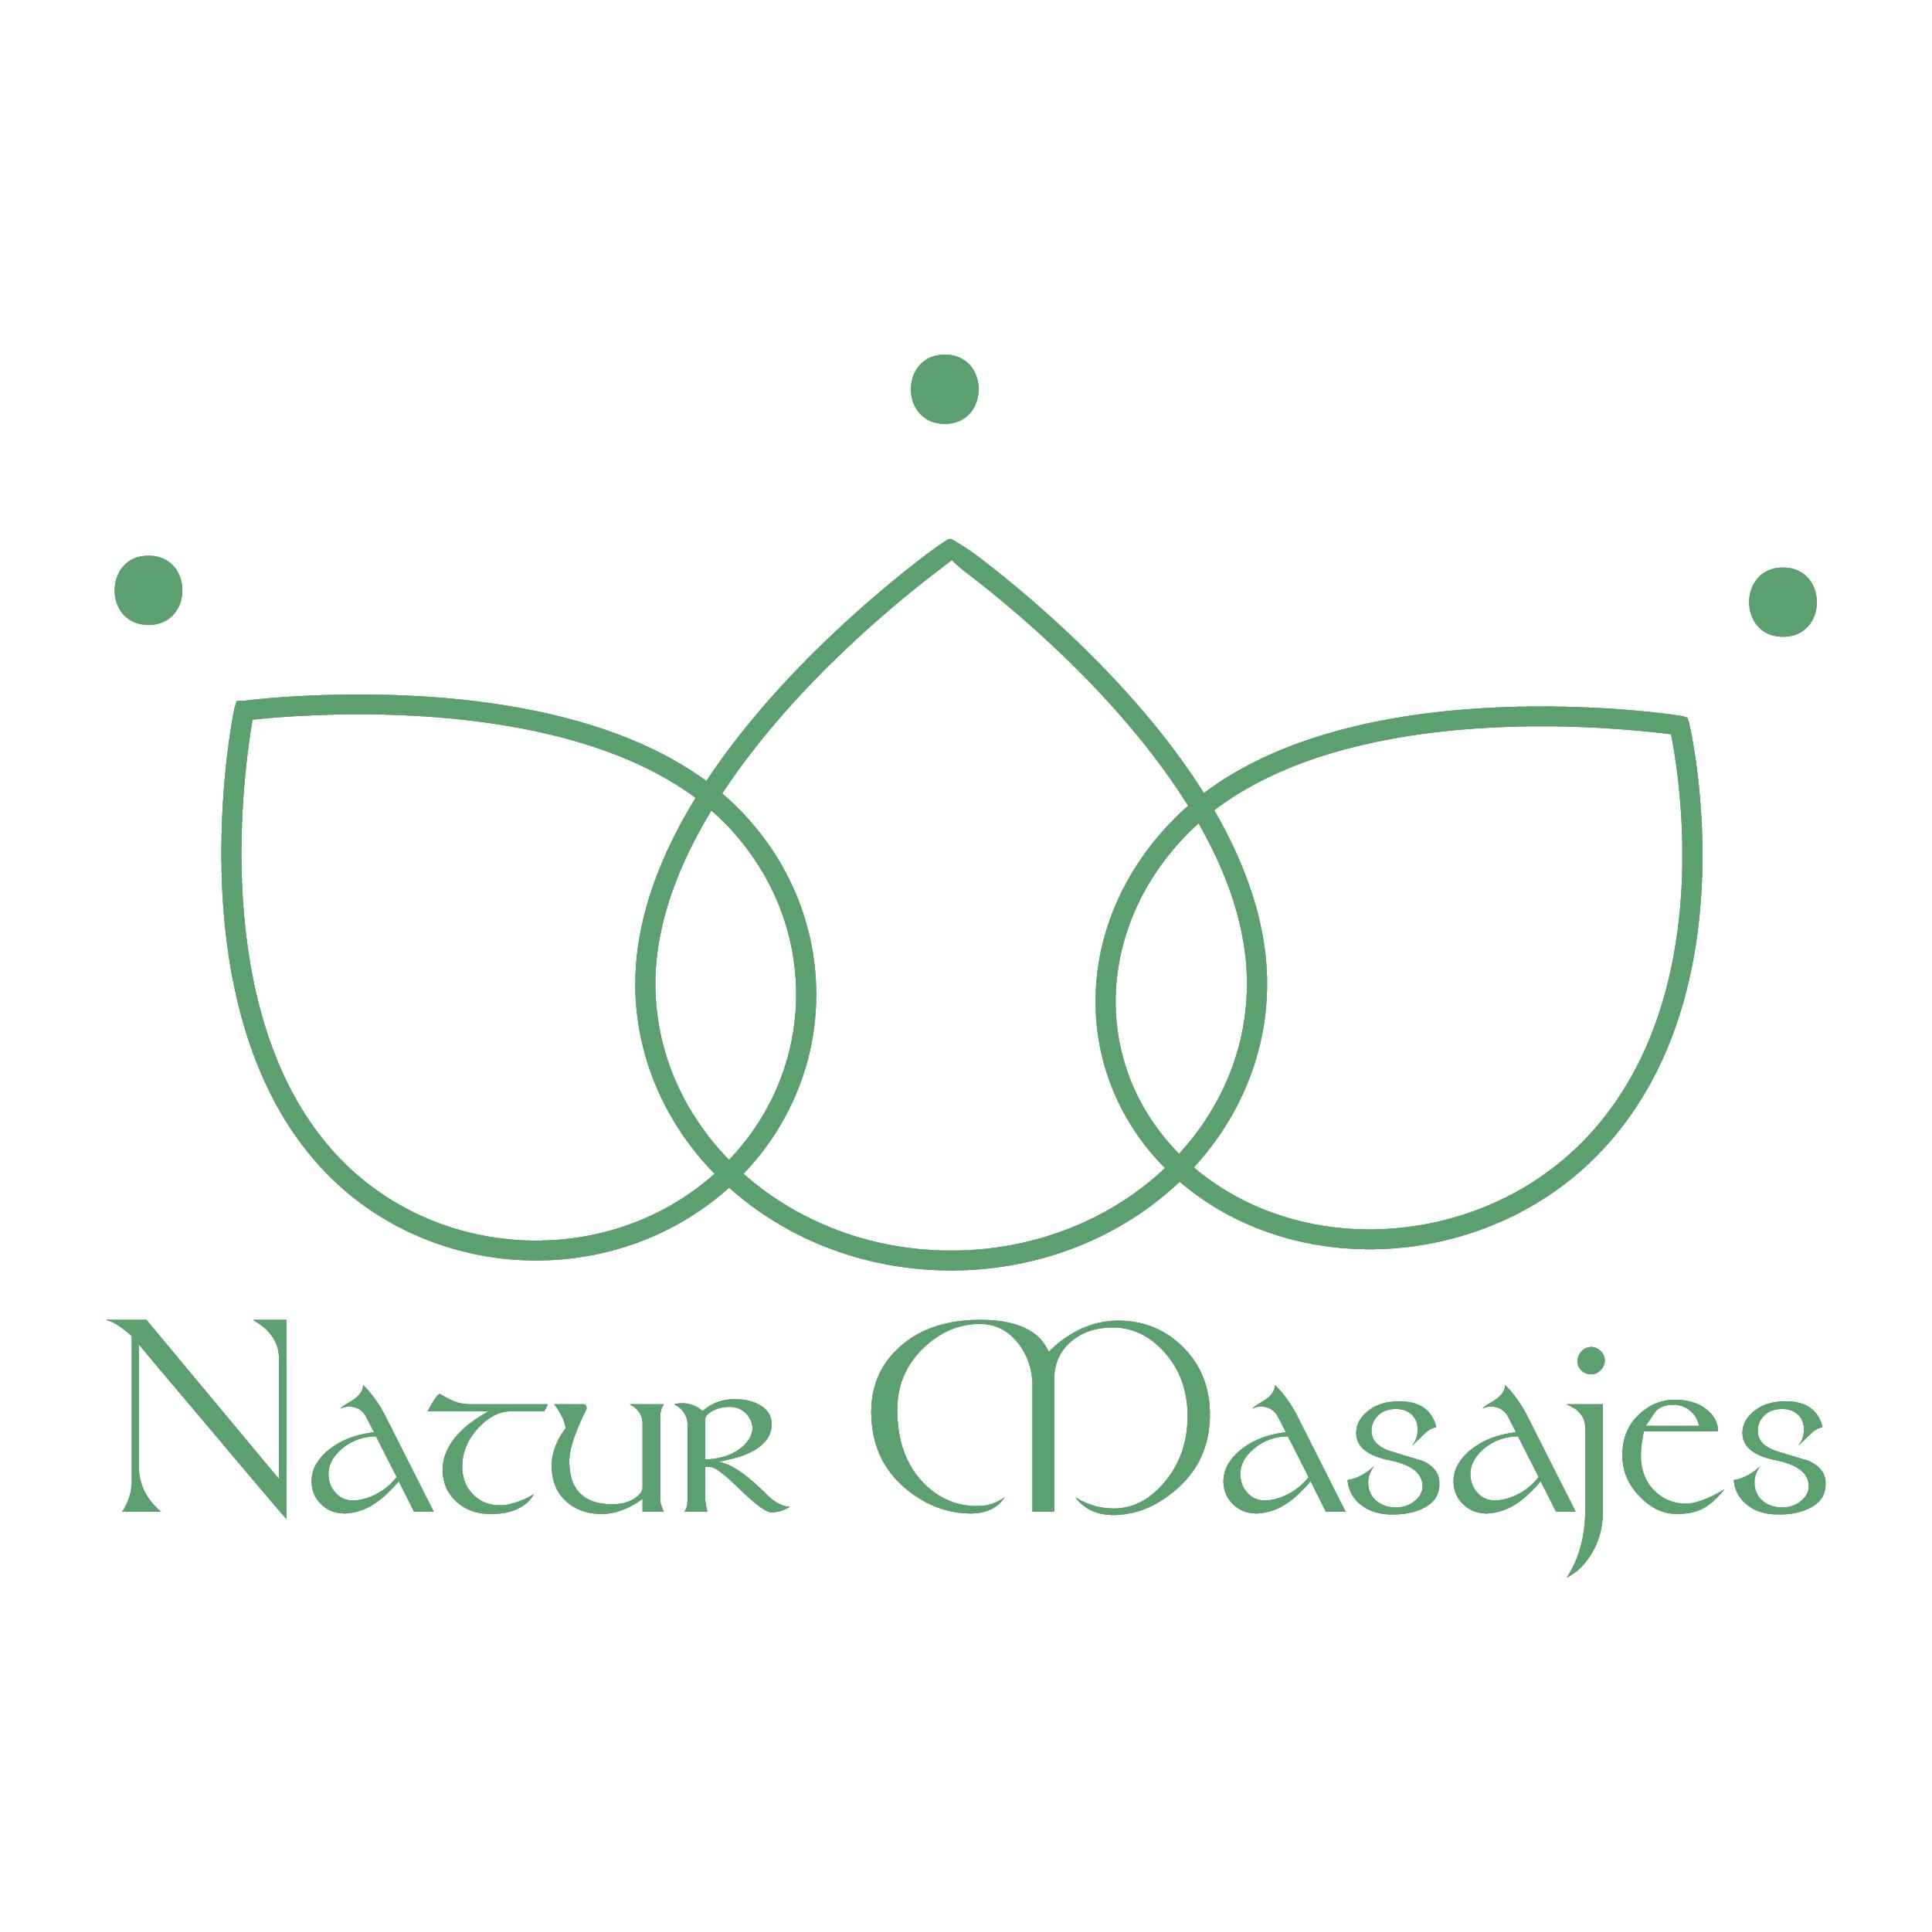 Logo de Natur Masajes